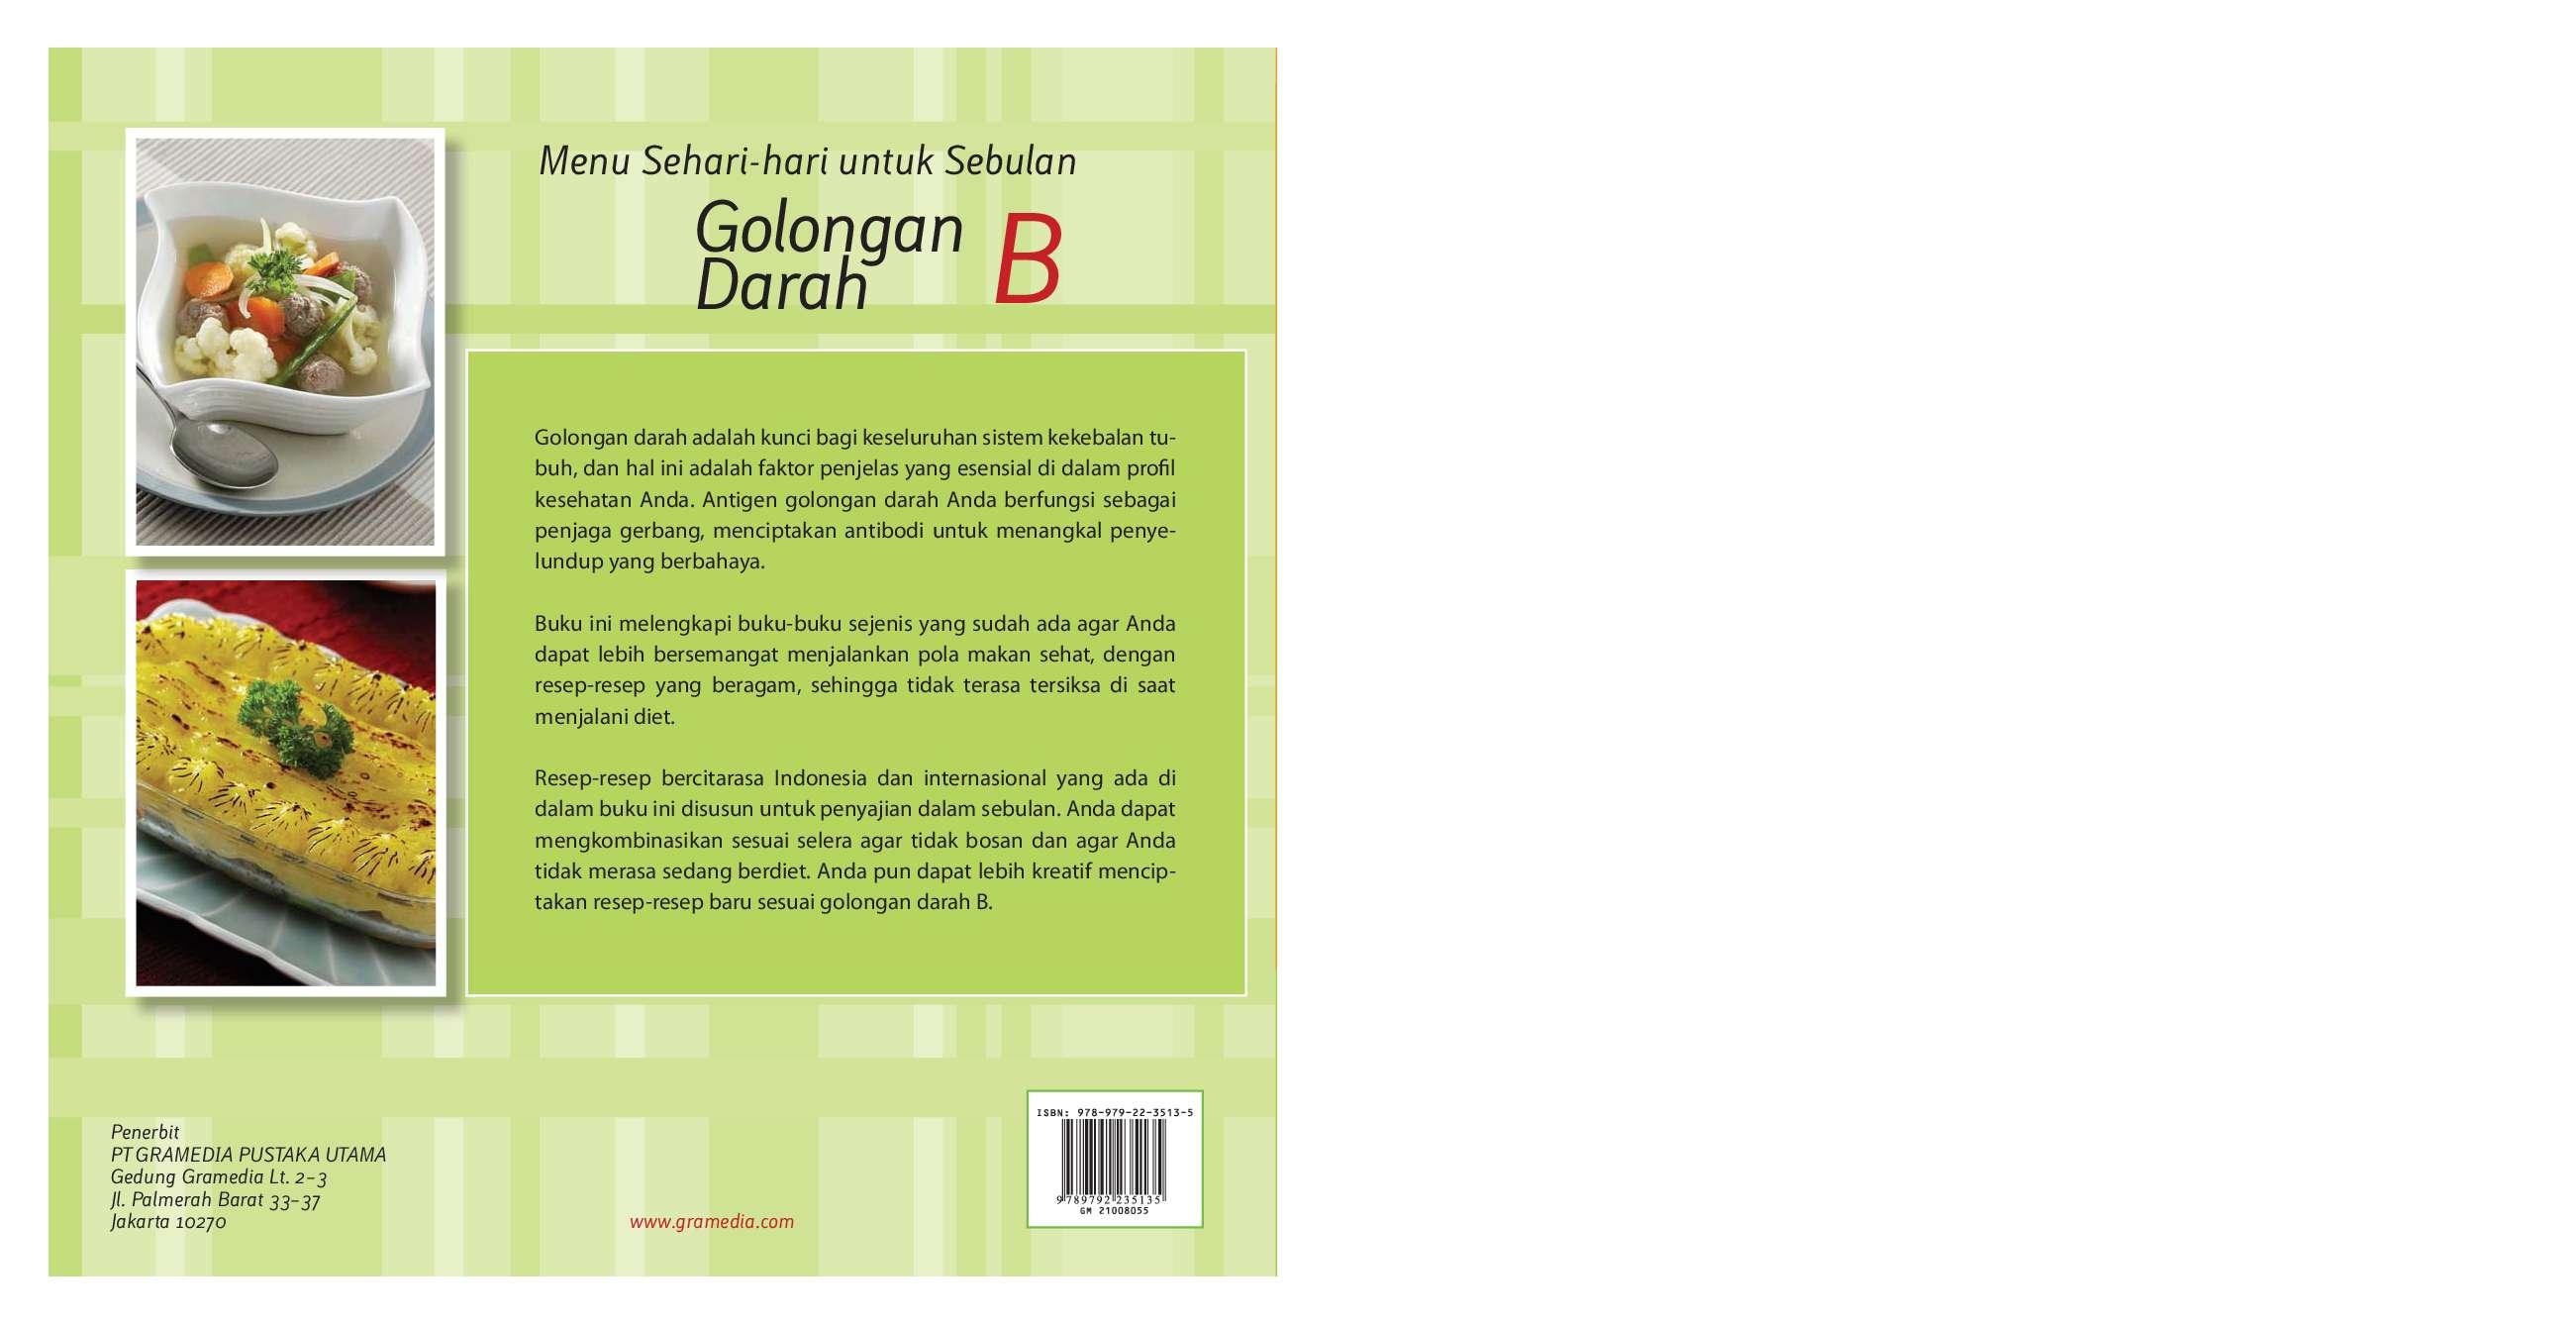 Menu Sehari Hari Untuk Sebulan Golongan Darah B Book By Ambarini Dr